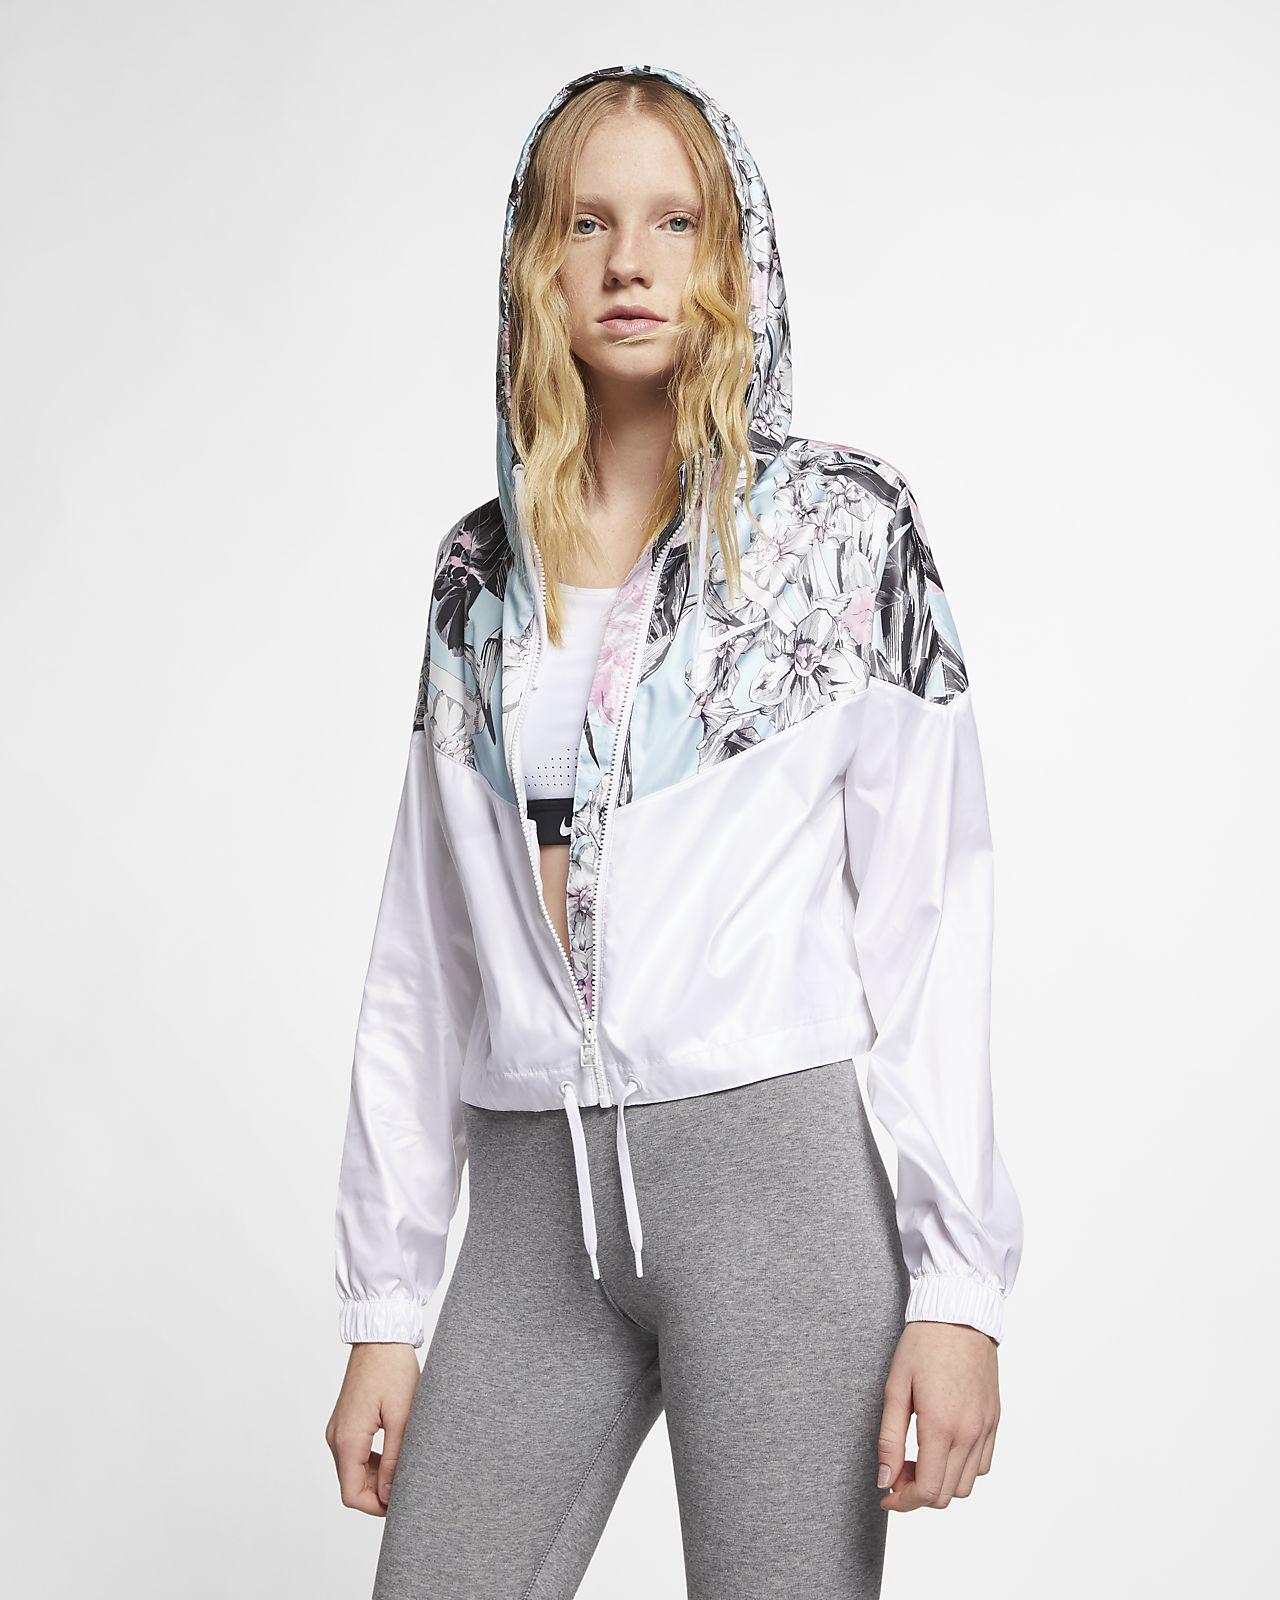 0148eb8ae0 Nike Sportswear Windrunner Women s Cropped Floral Jacket. Nike.com CH